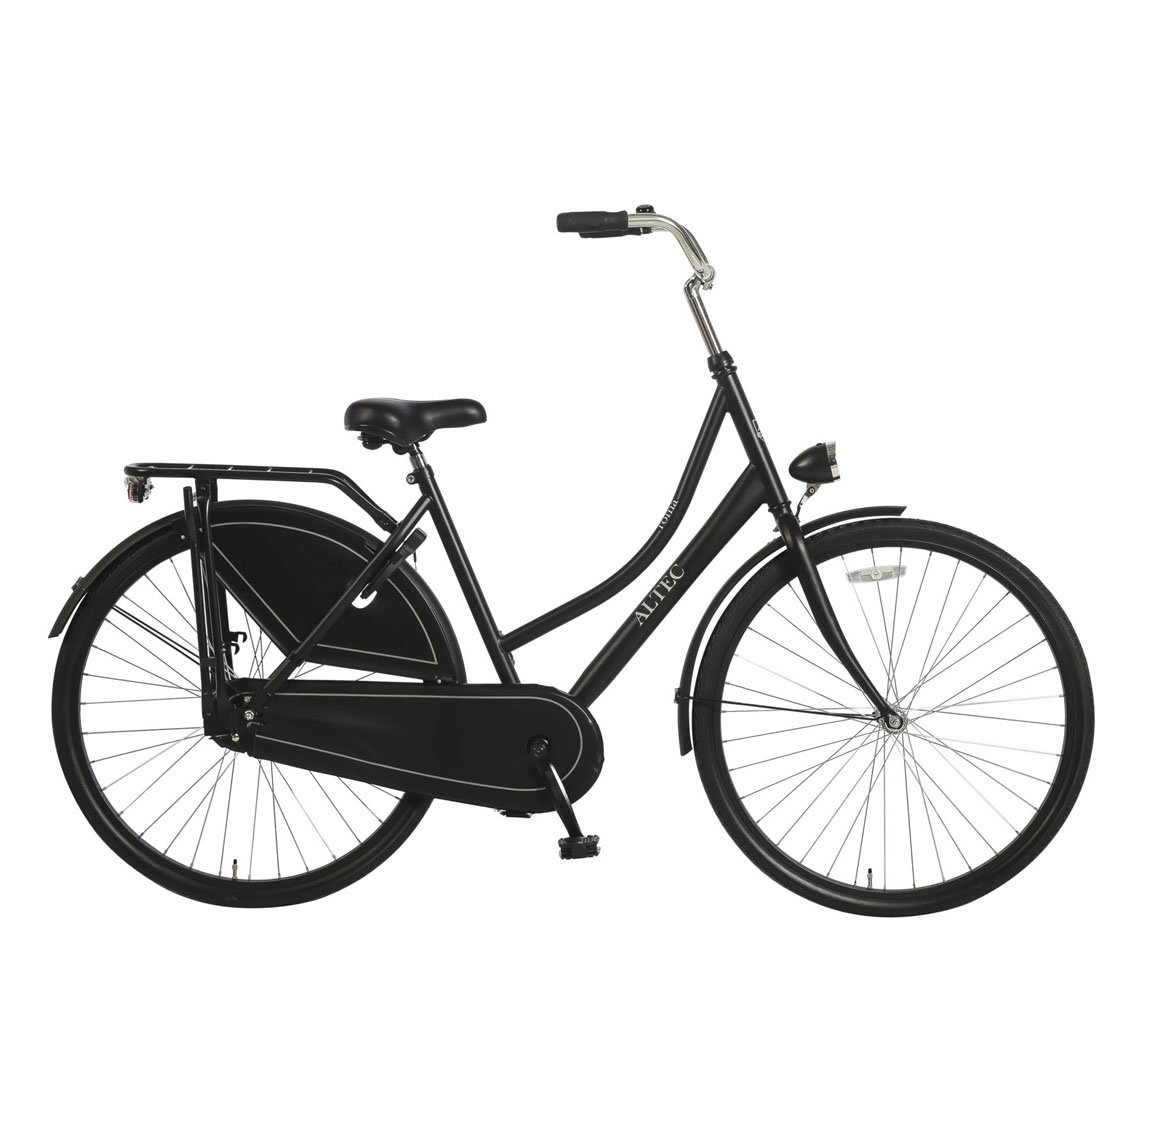 Altec-Roma-28-inch-Omafiets-Zwart-2018